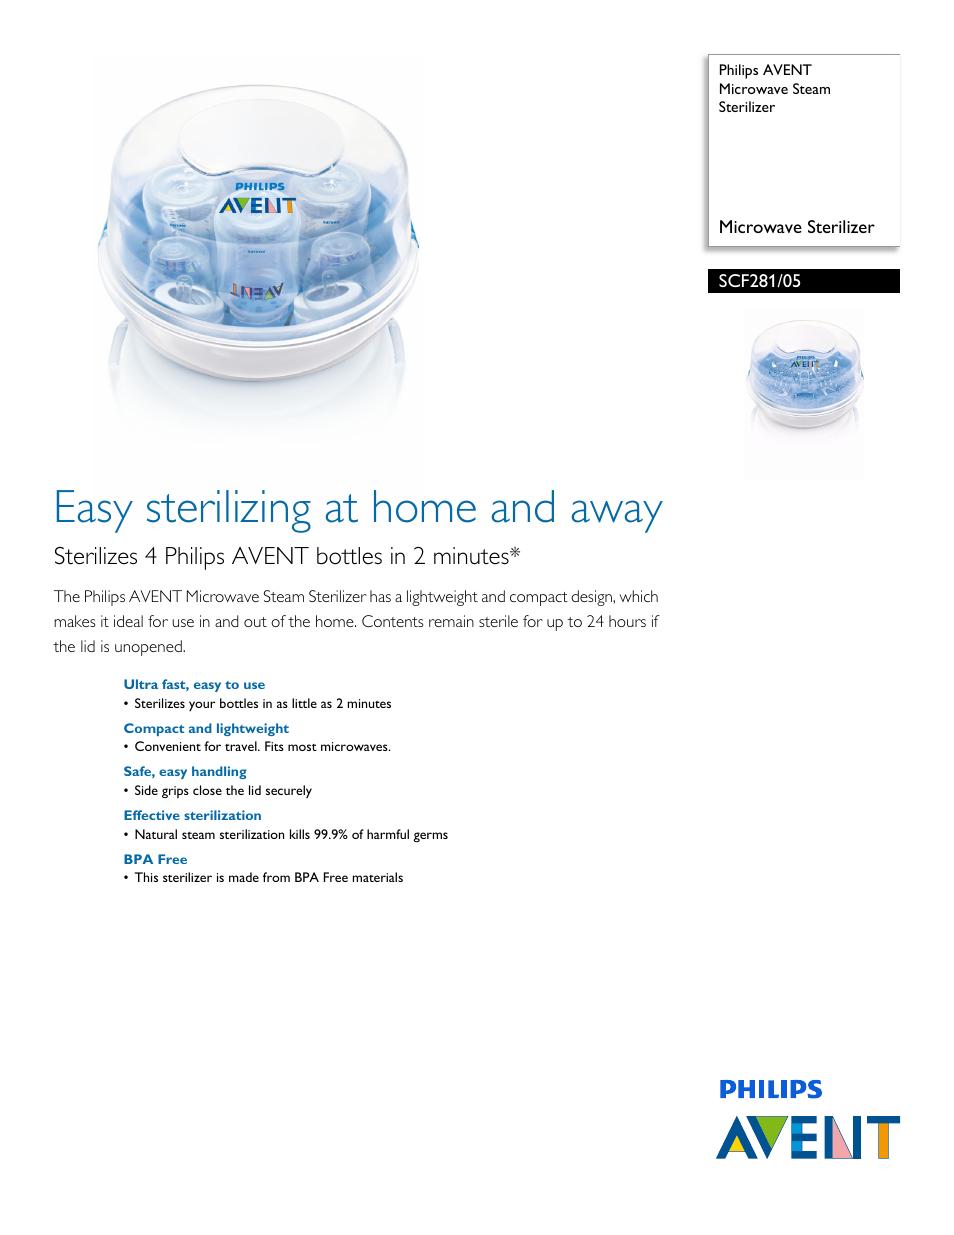 Philips Avent Microwave Steam Sterilizer Scf281 05